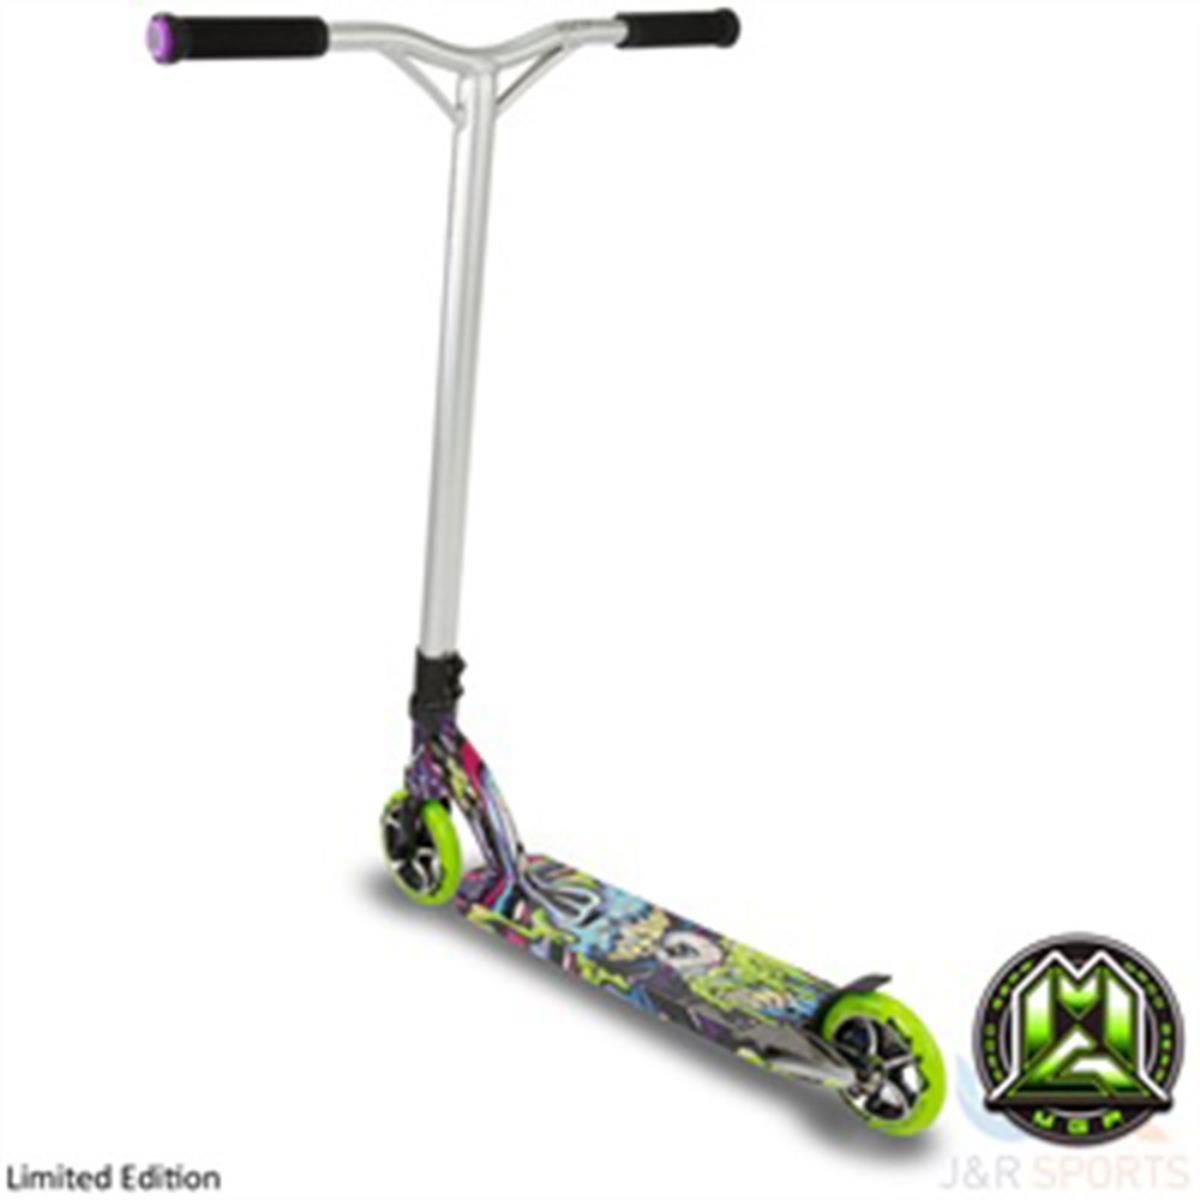 Dakine 185cm Boundary Double 2x Ski Roller Luggage Bag Field Camo